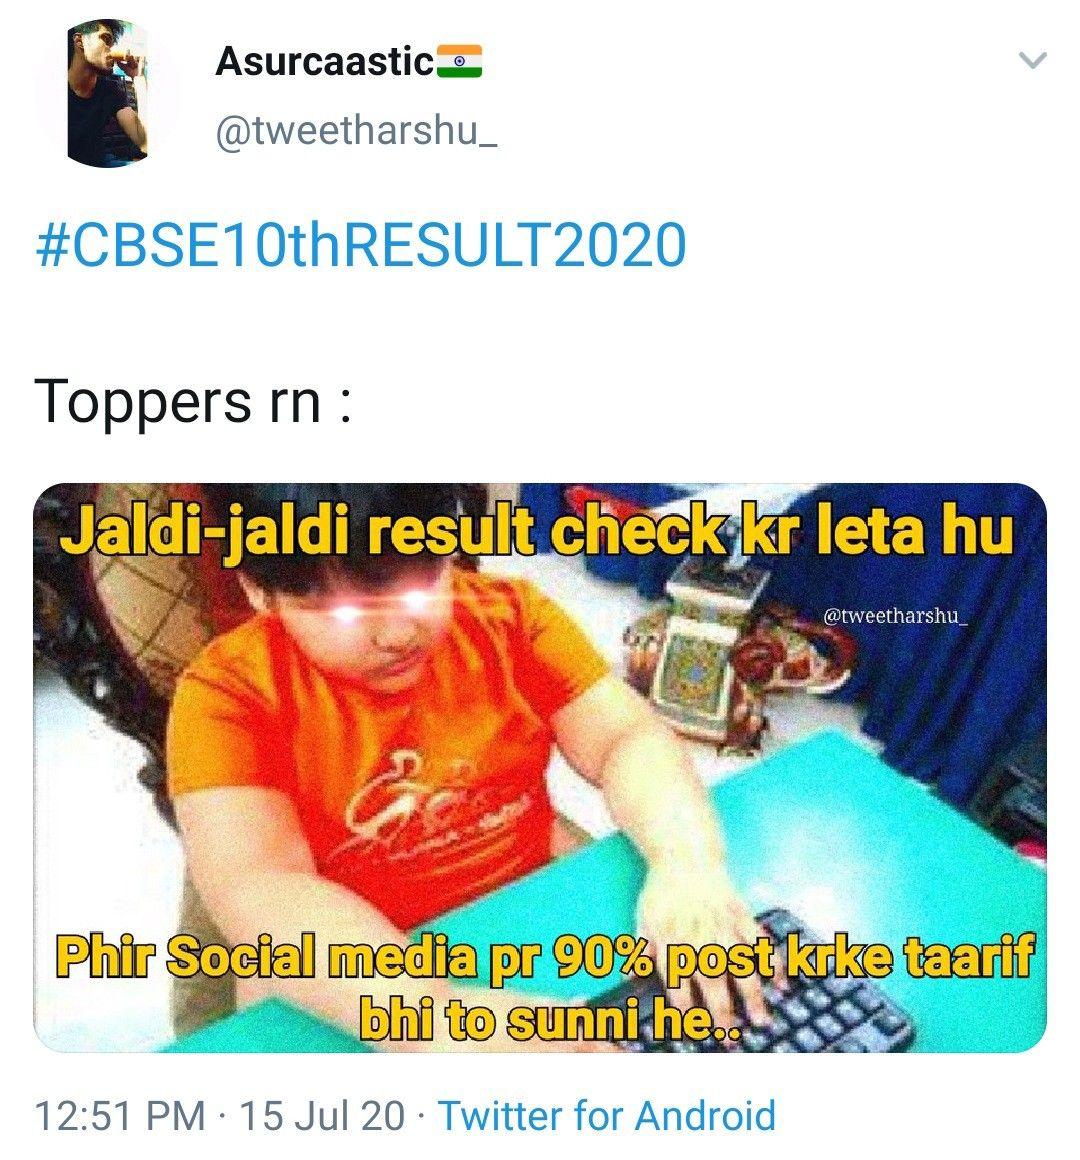 School Meme Cbse Result Meme Class 10th Funny Memes Funny Indian Memes Hindi Memes Funny Memes School Memes Memes